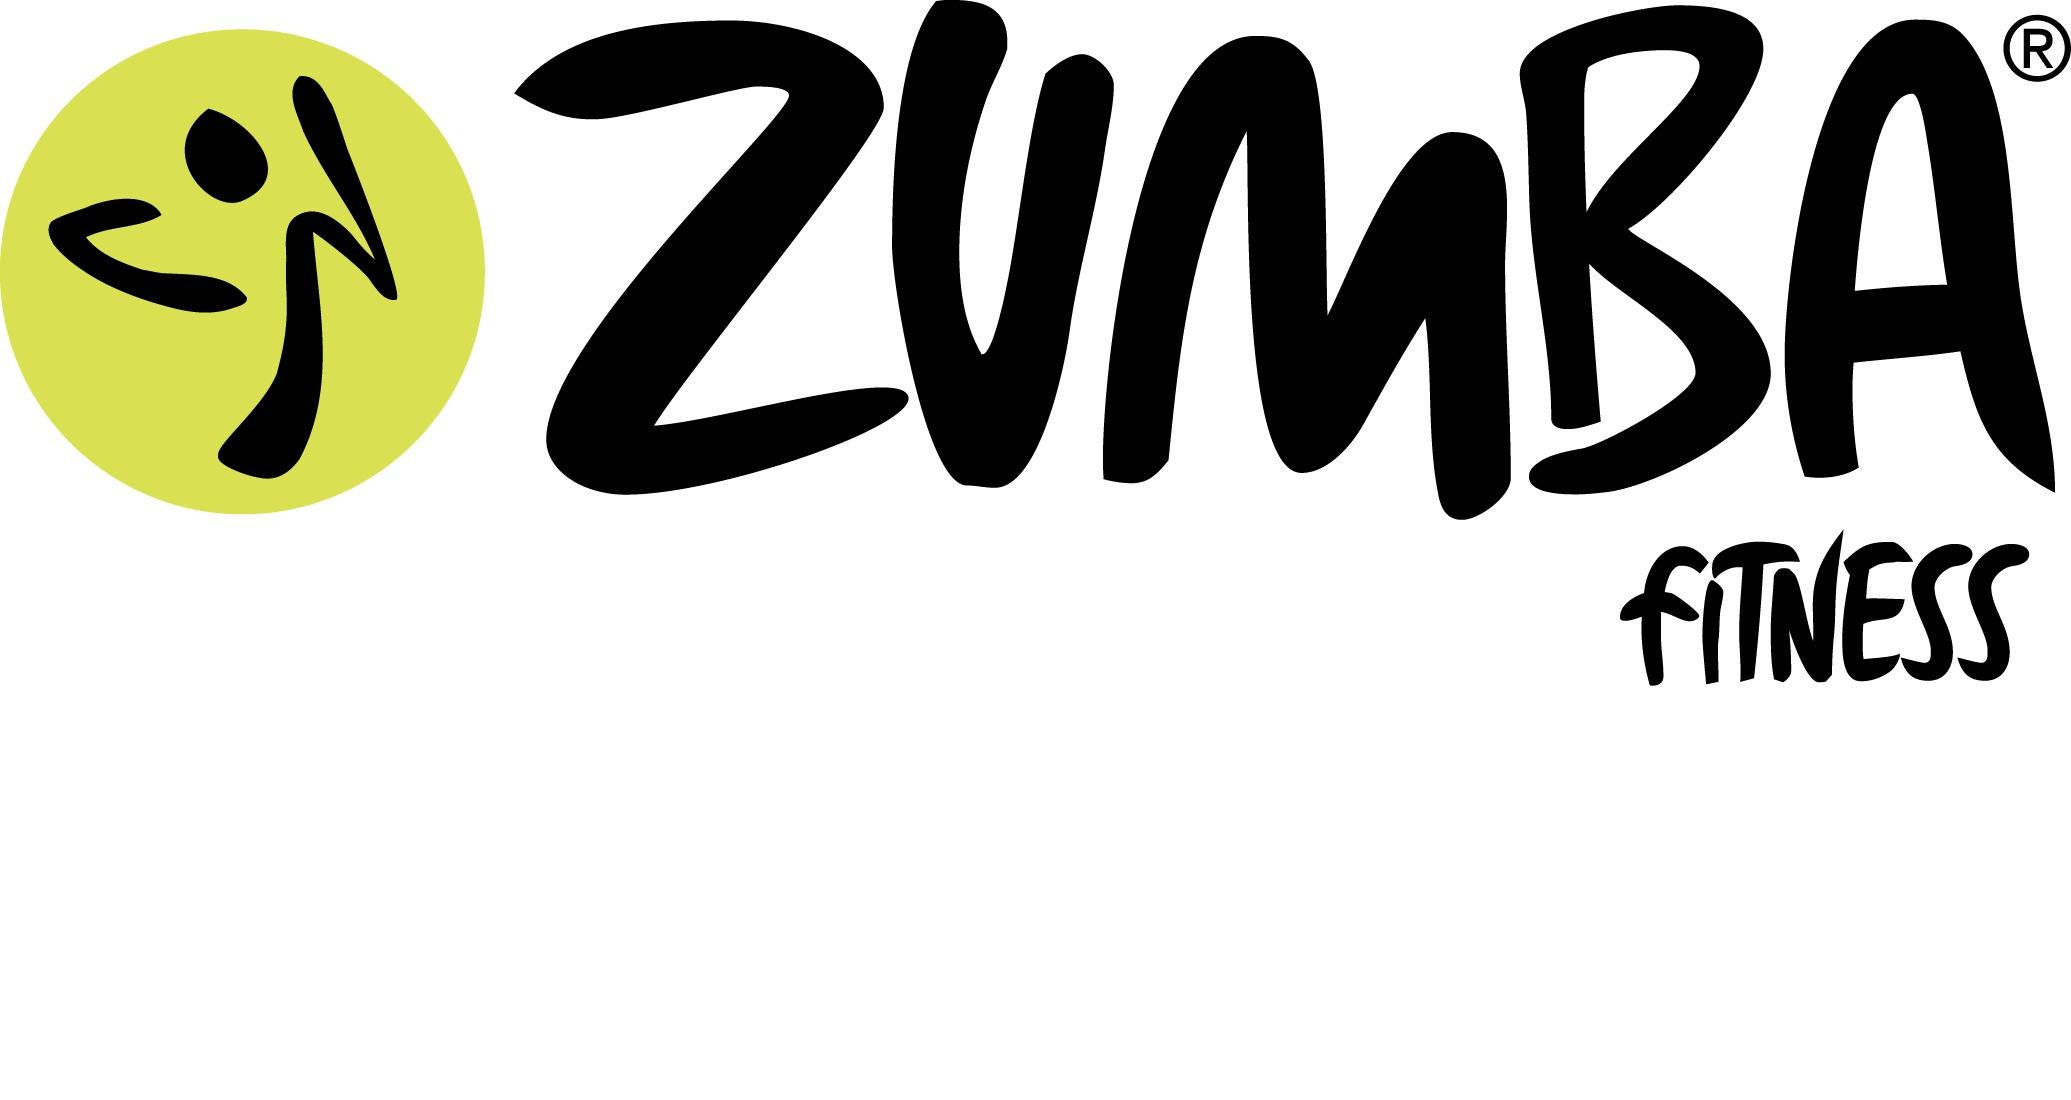 Zumba logo clipart clipartfest 2